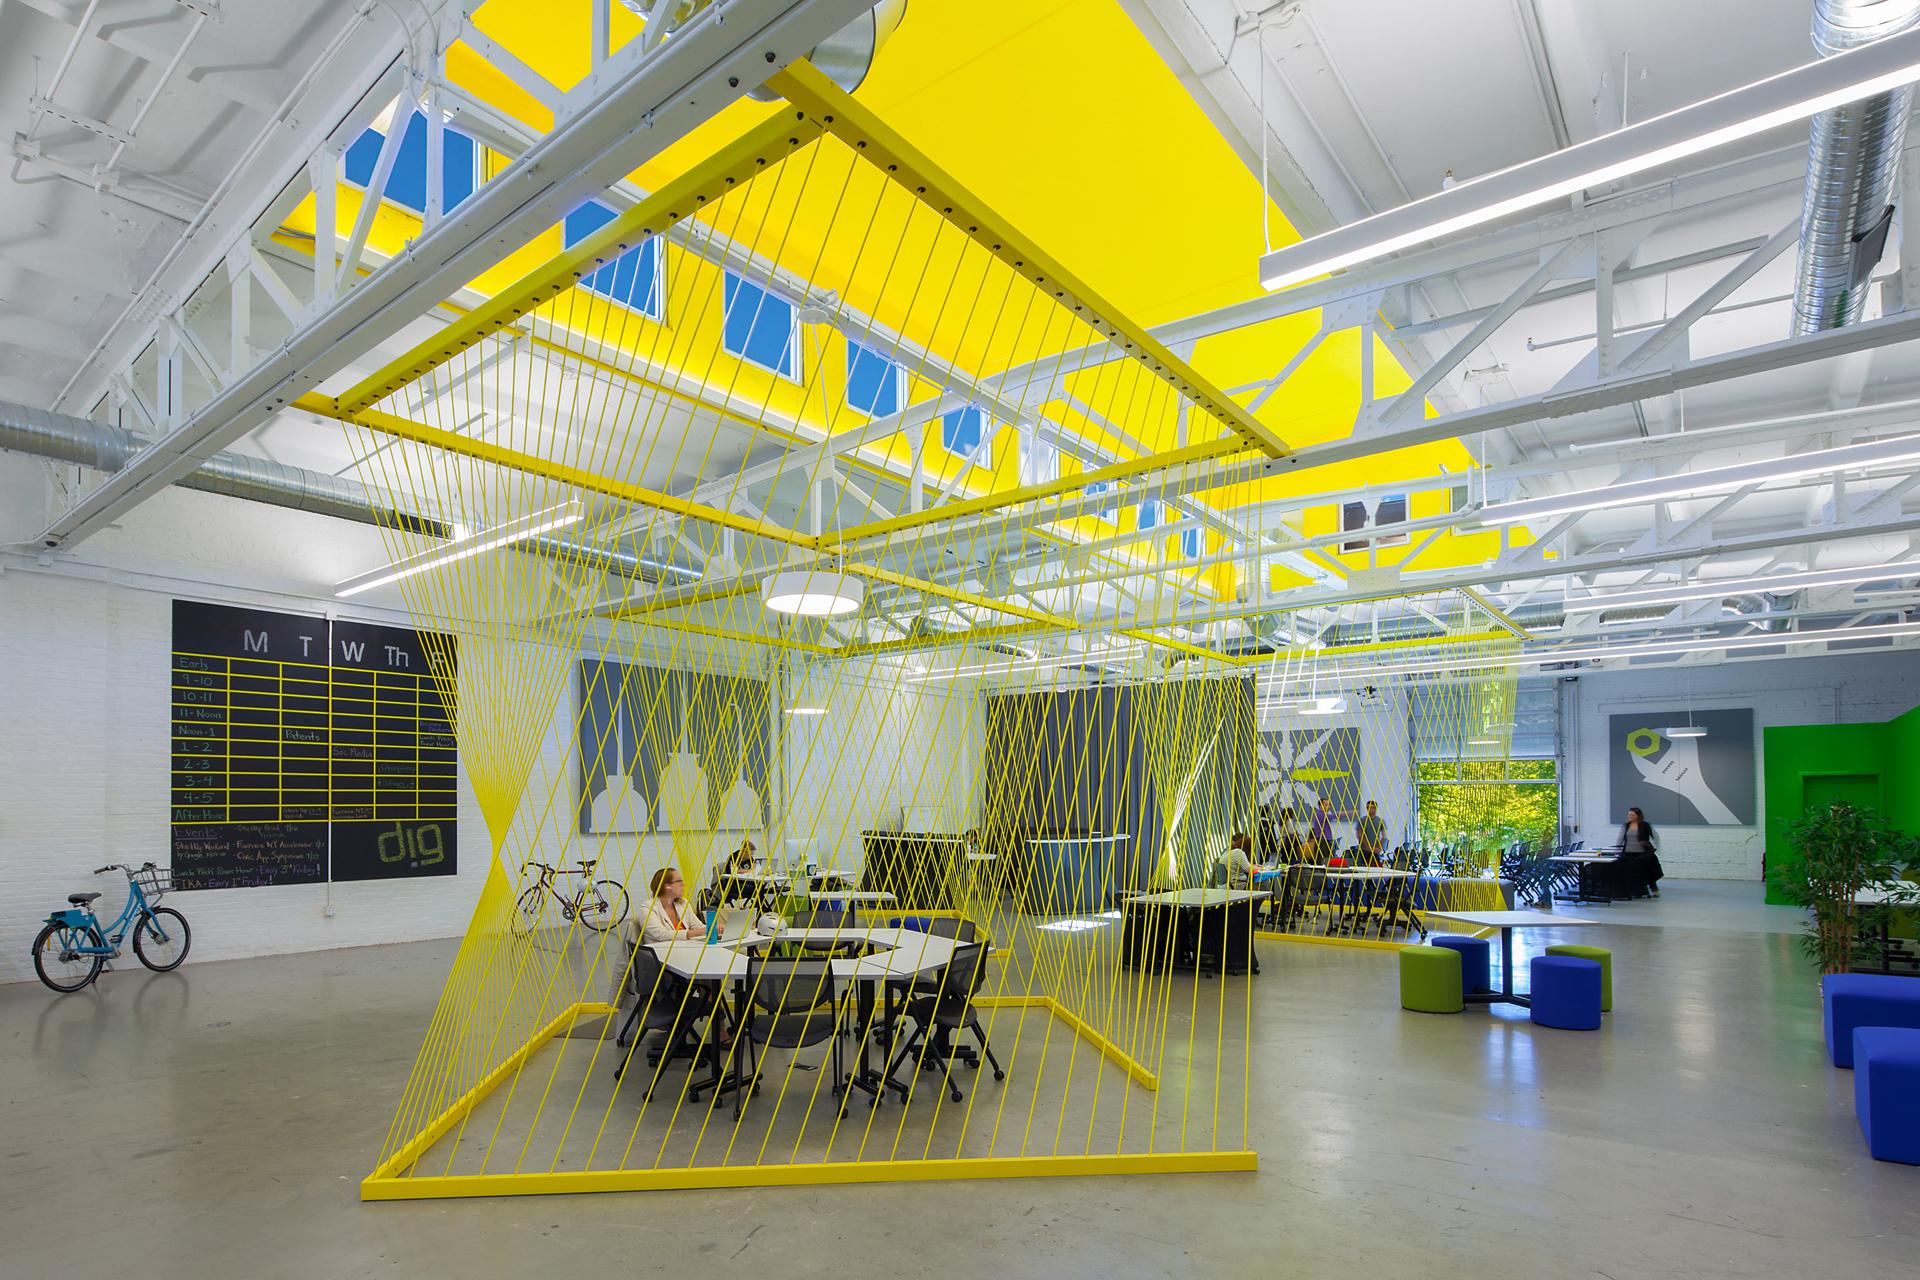 d!g Buffalo / The Design Innovation Garage